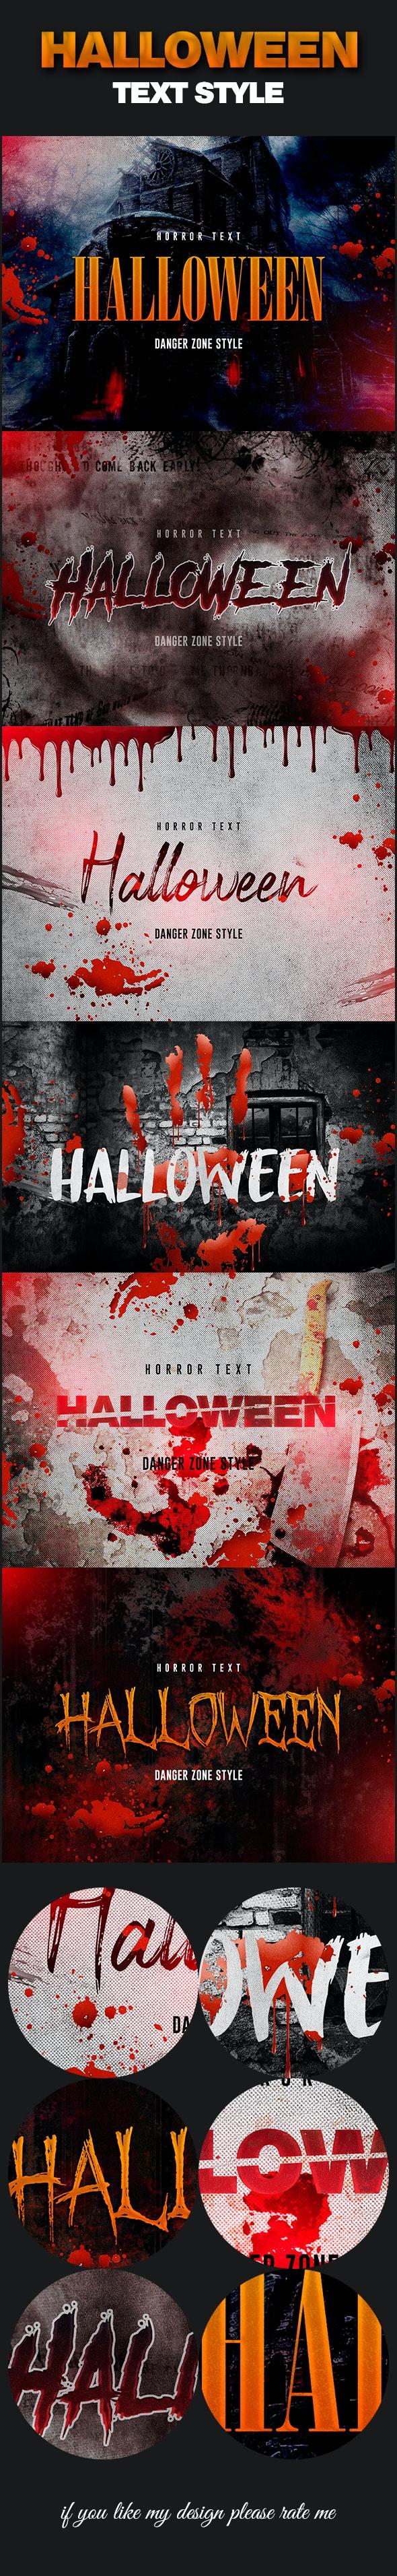 Halloween Horror Text Effect - Text Effects Styles